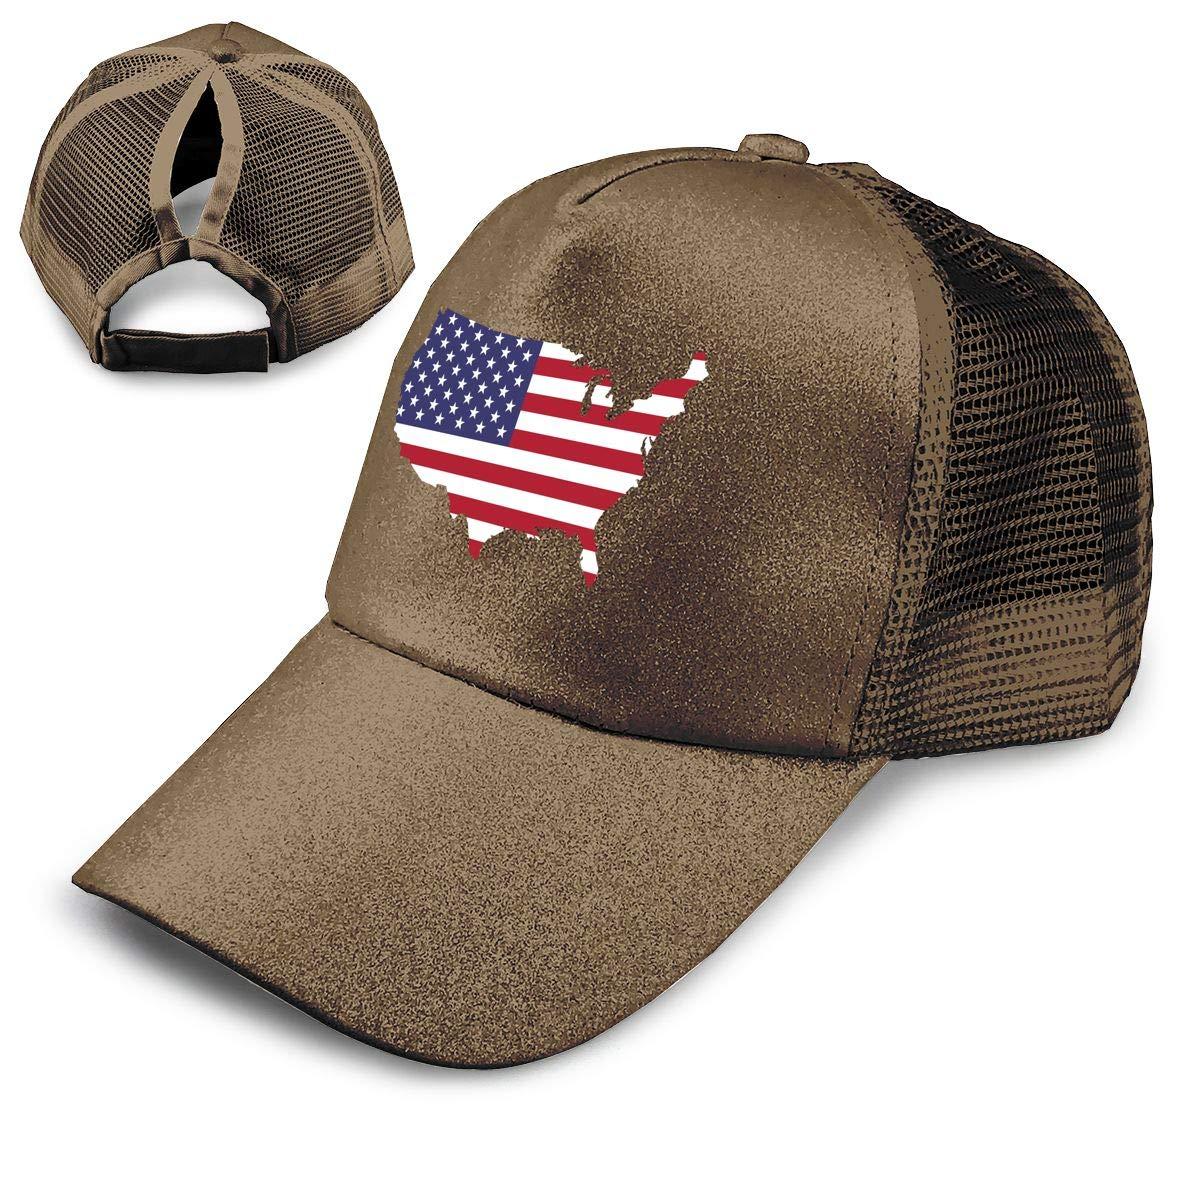 America Ponytail Messy High Bun Hat Ponycaps Baseball Cap Adjustable Trucker Cap Mesh Cap